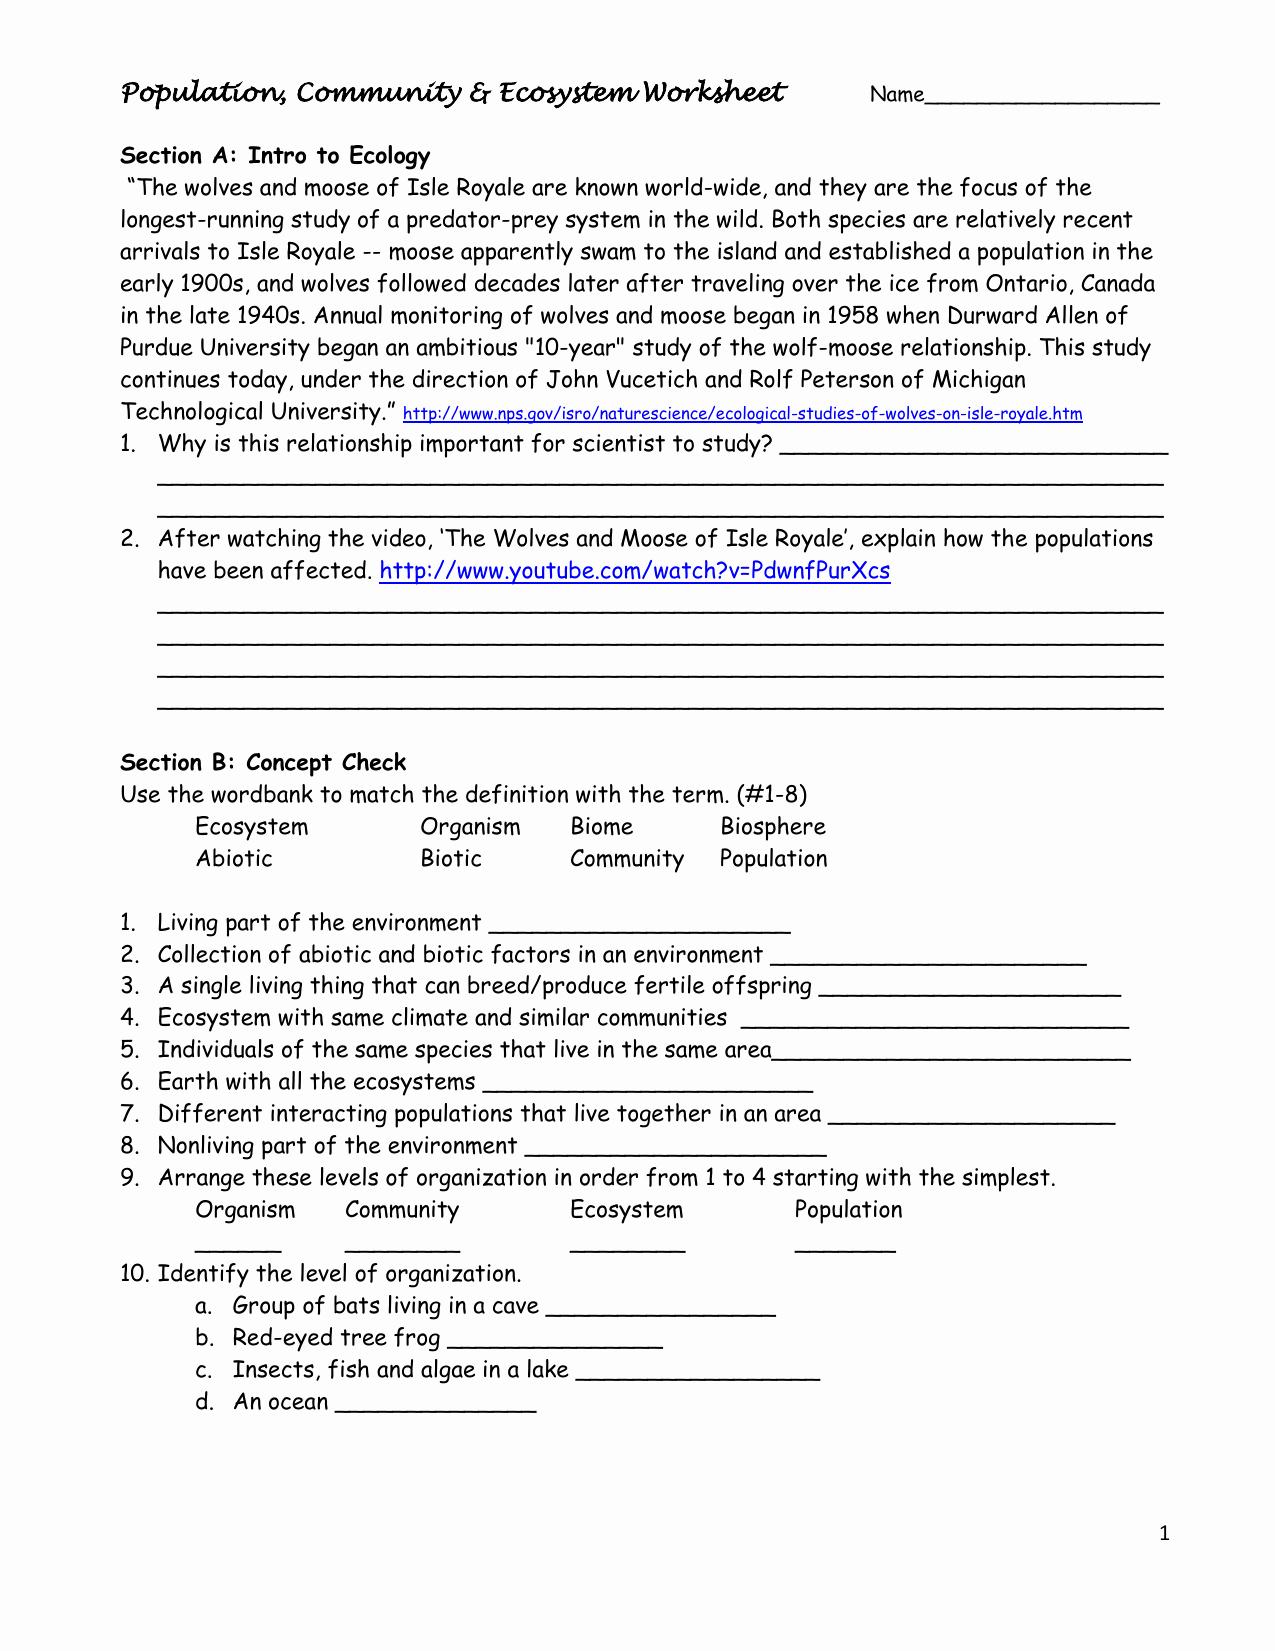 50 Energy Flow Worksheet Answers